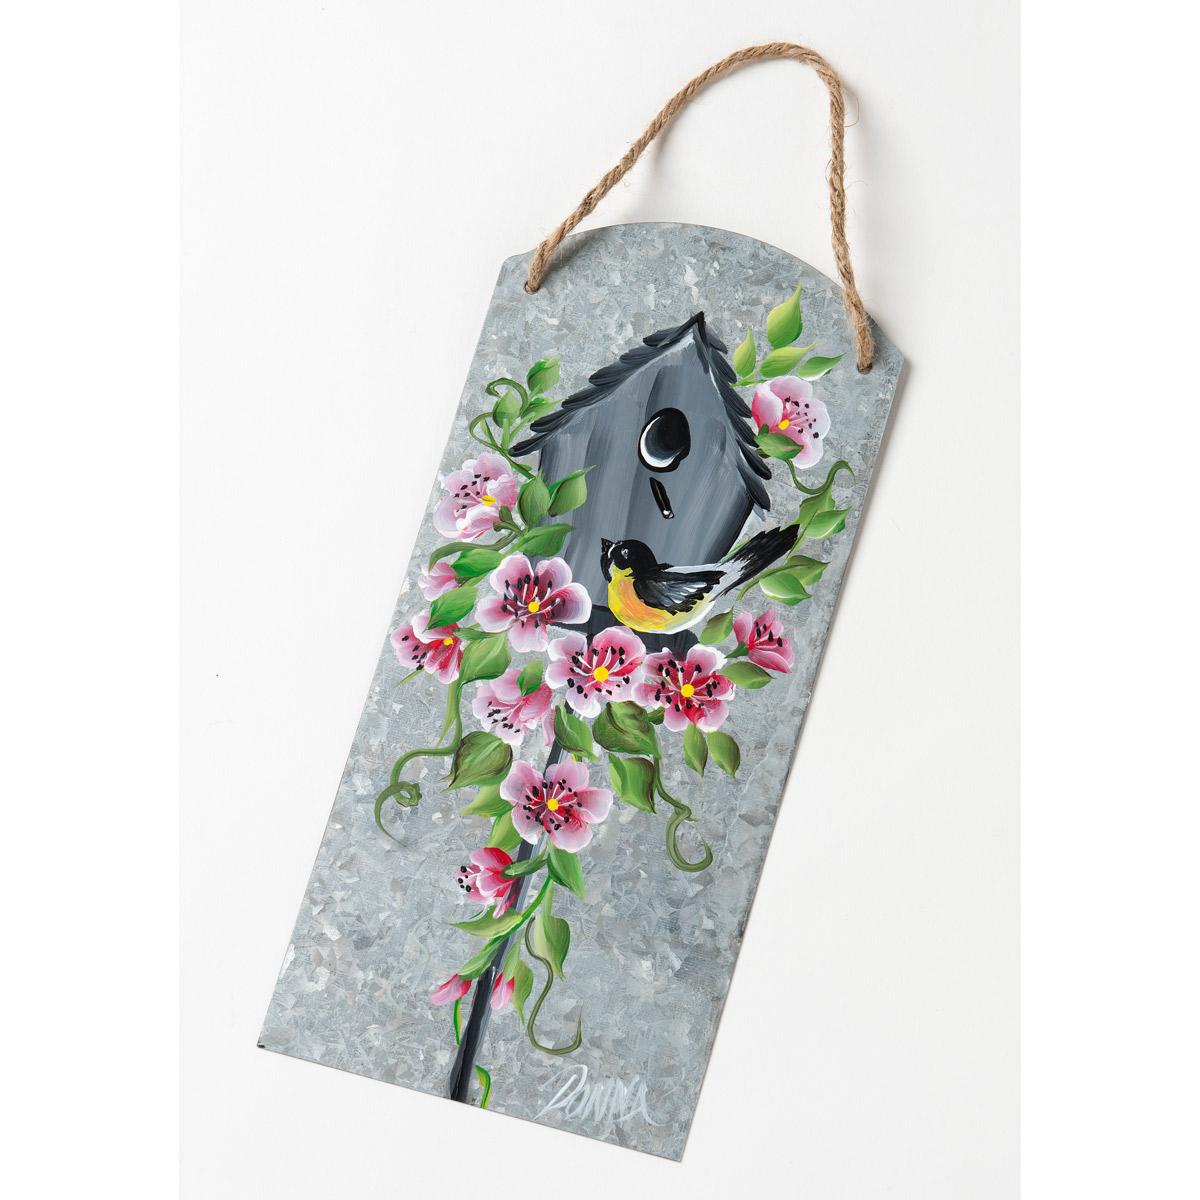 FolkArt ® One Stroke™ Spring Holiday Painting Kit